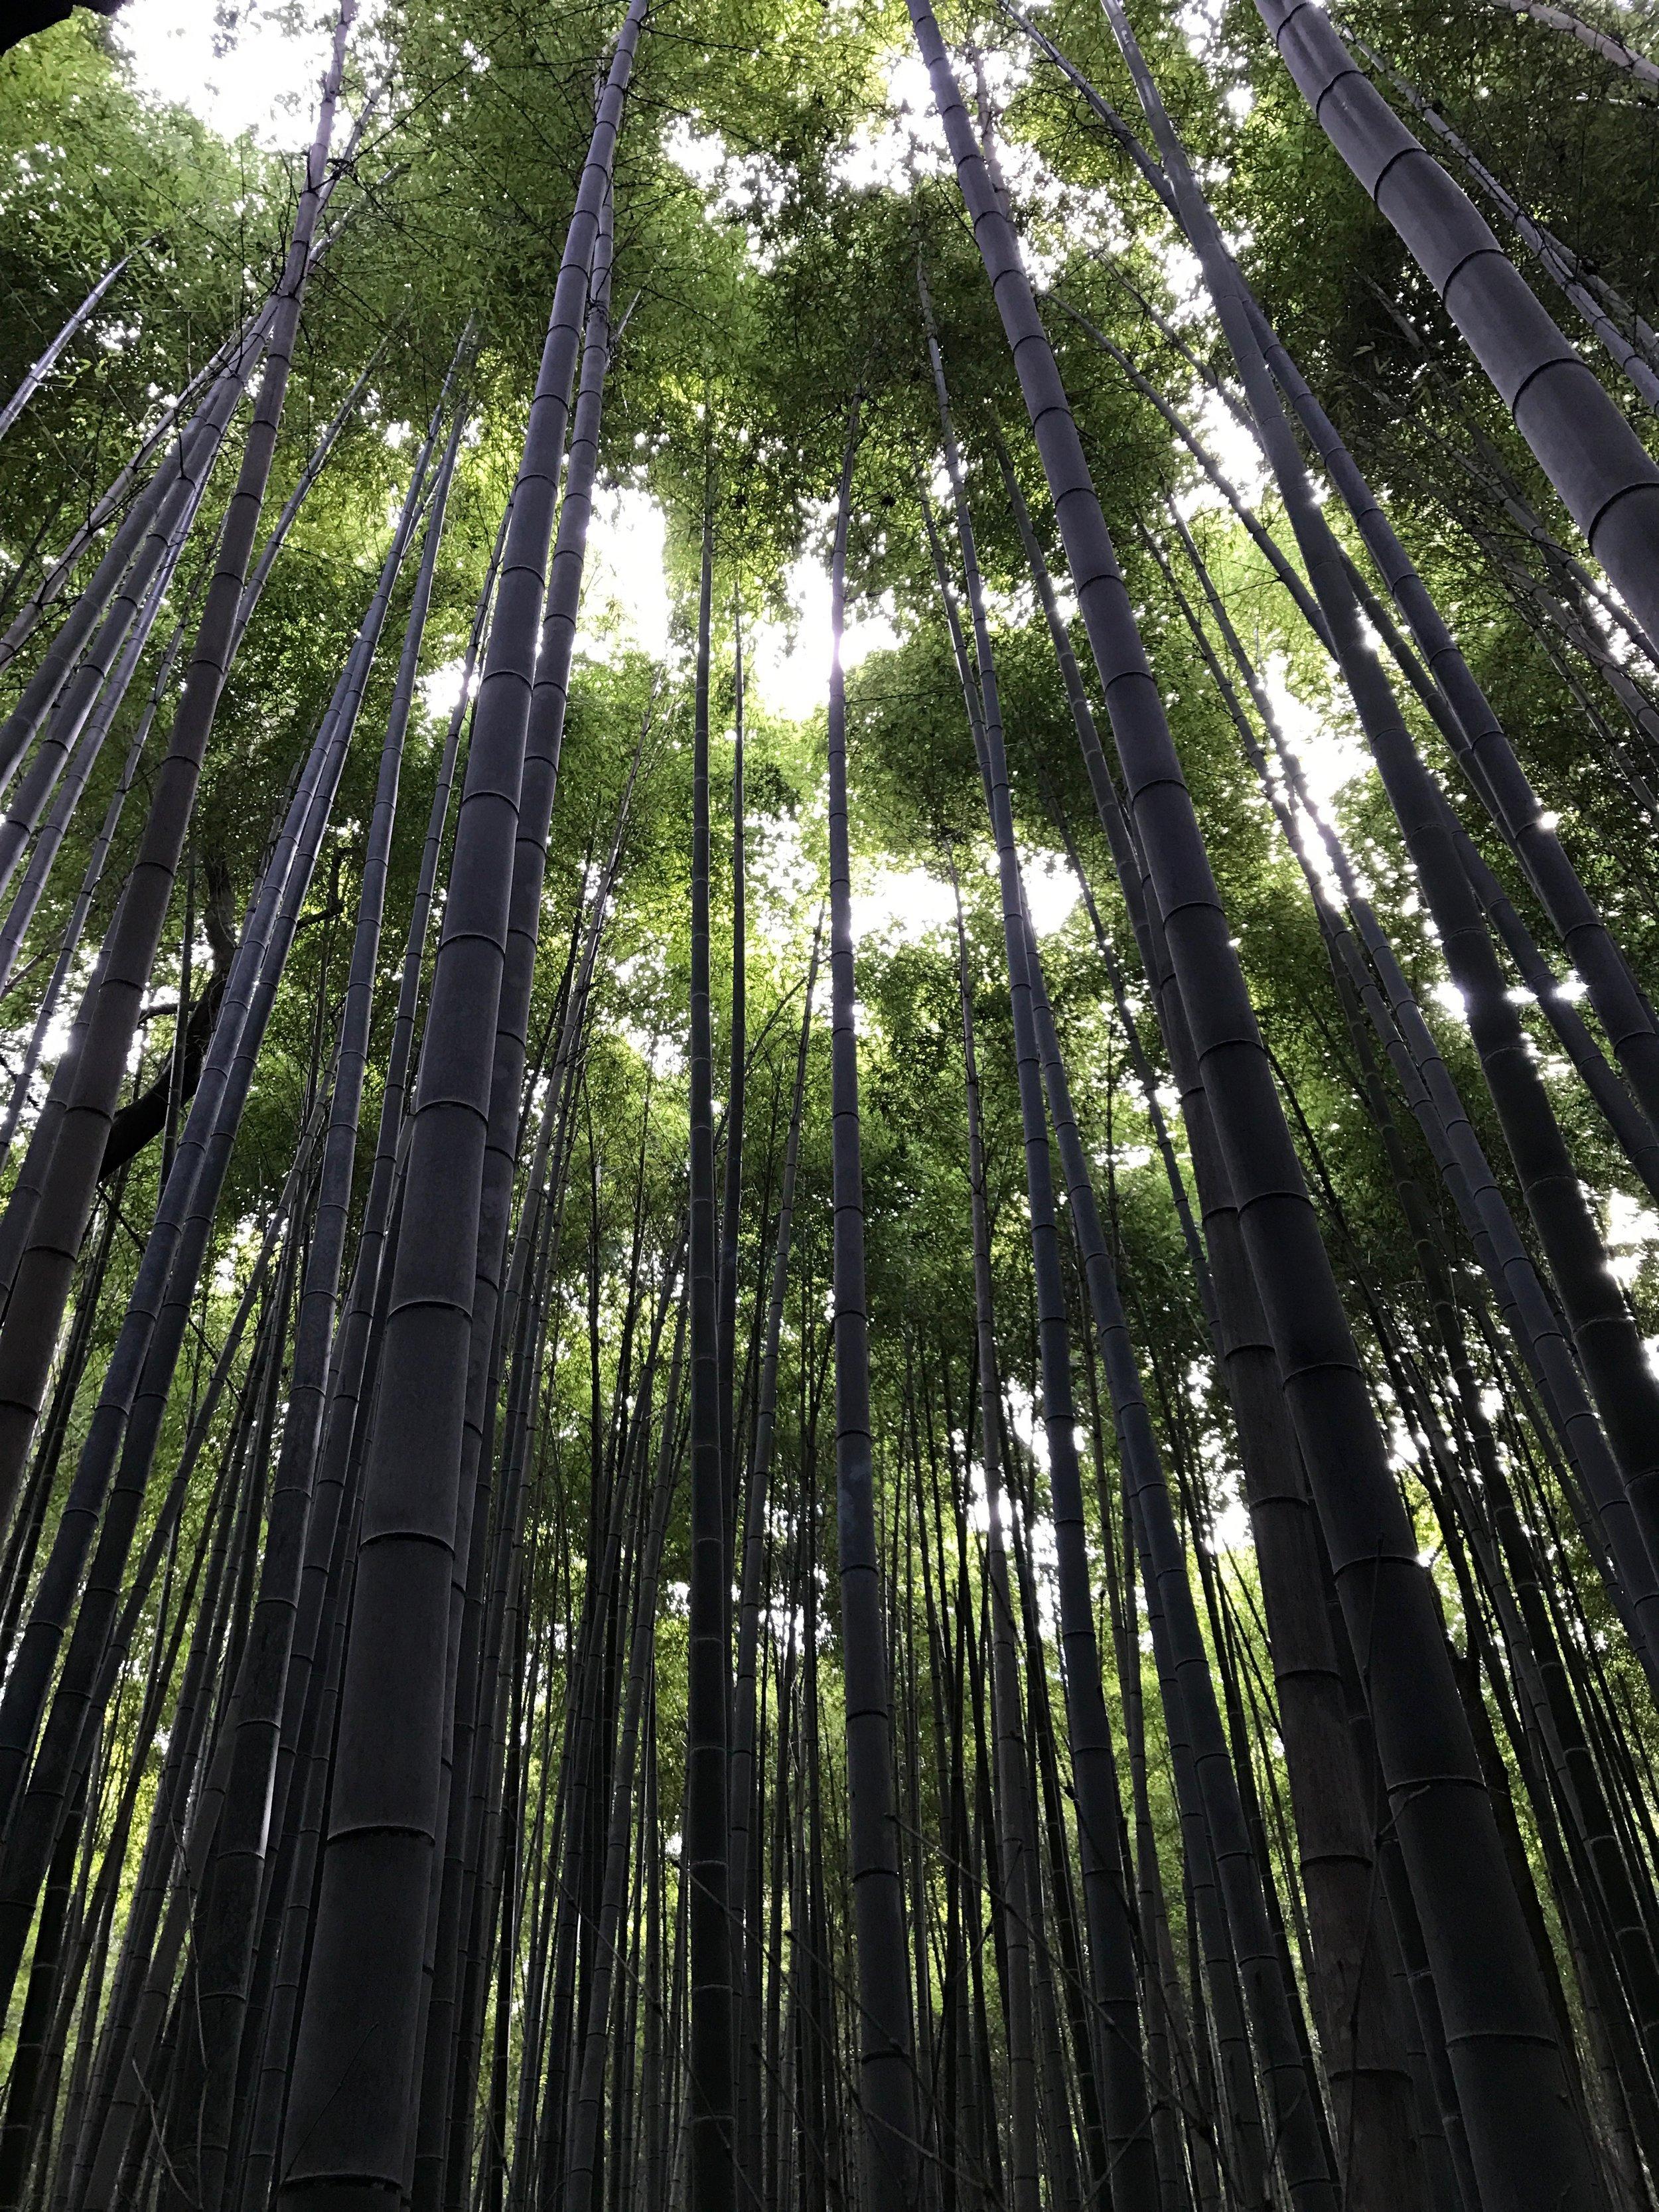 Bamboo Forest, Arashiyama District, Kyoto